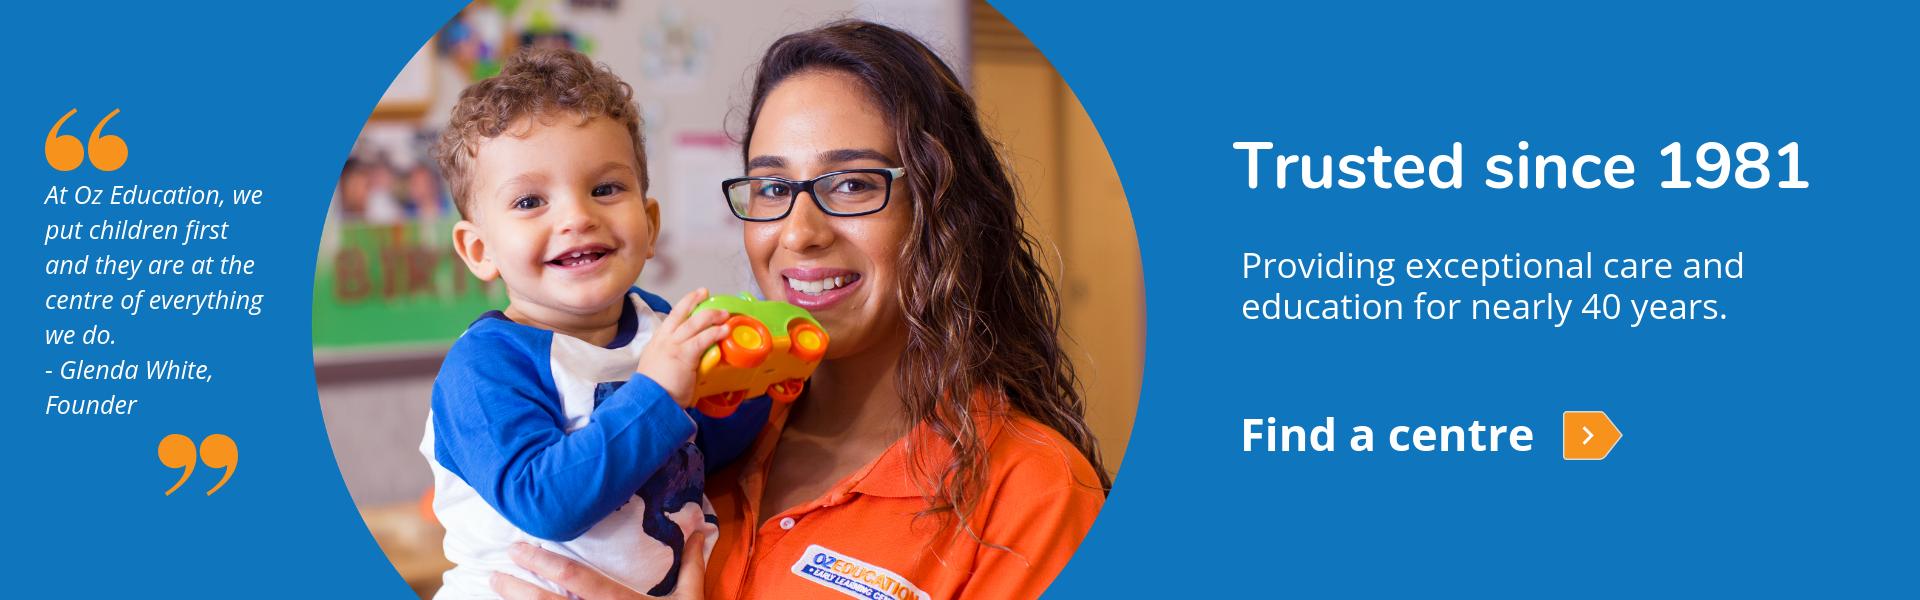 Find a child care, preschool, daycare or kindergarten near you.